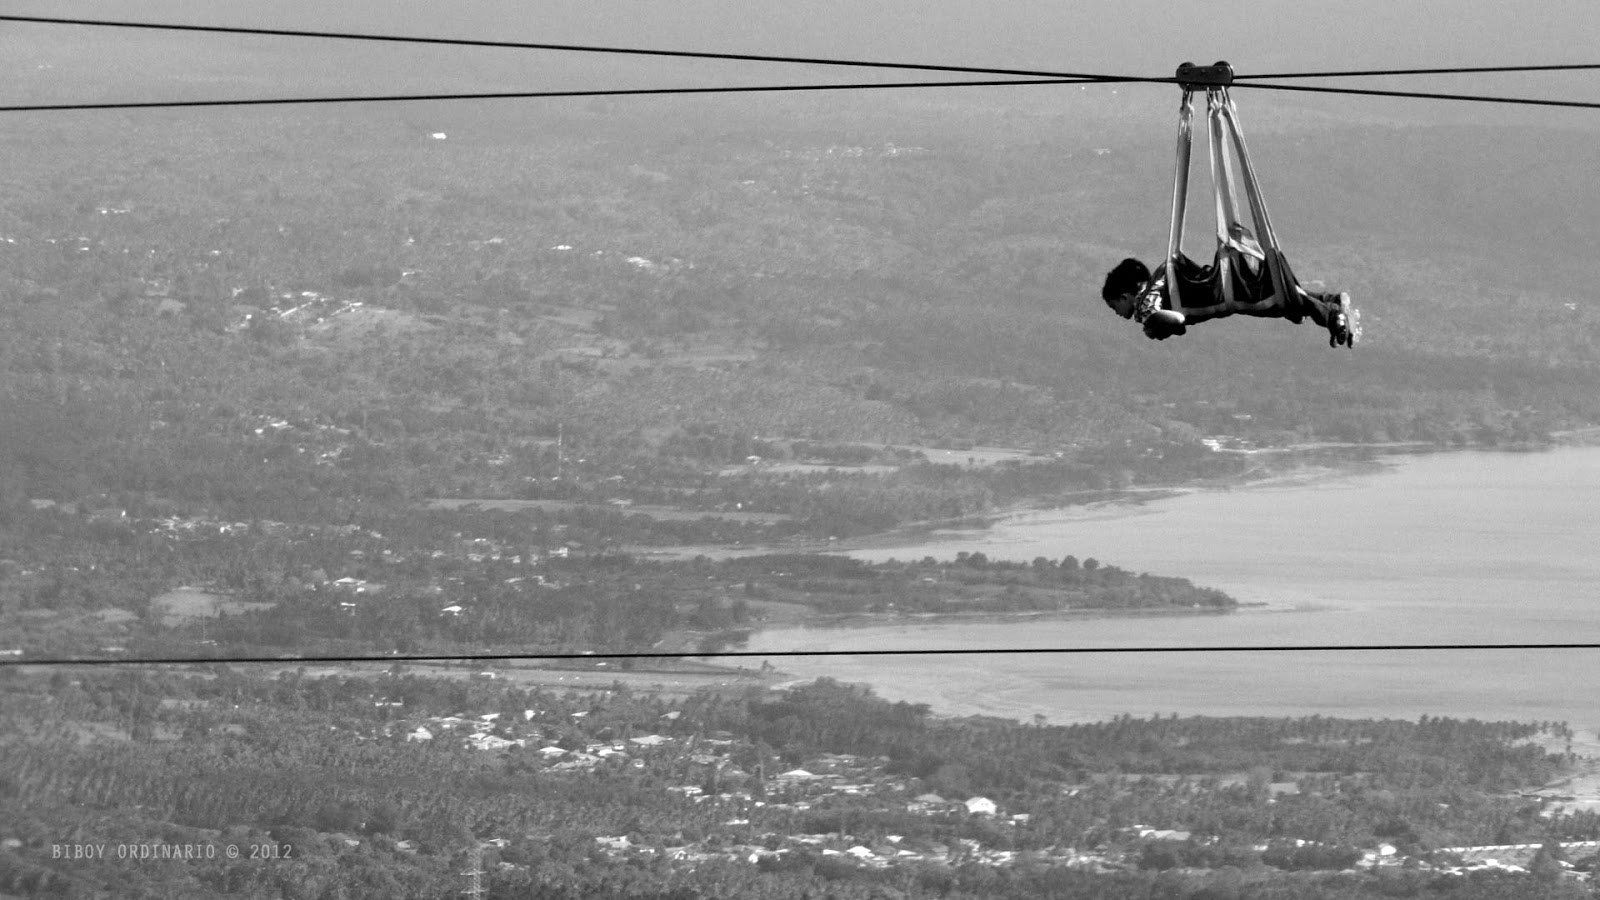 Zipline in Picnic grove, Tagaytay, City